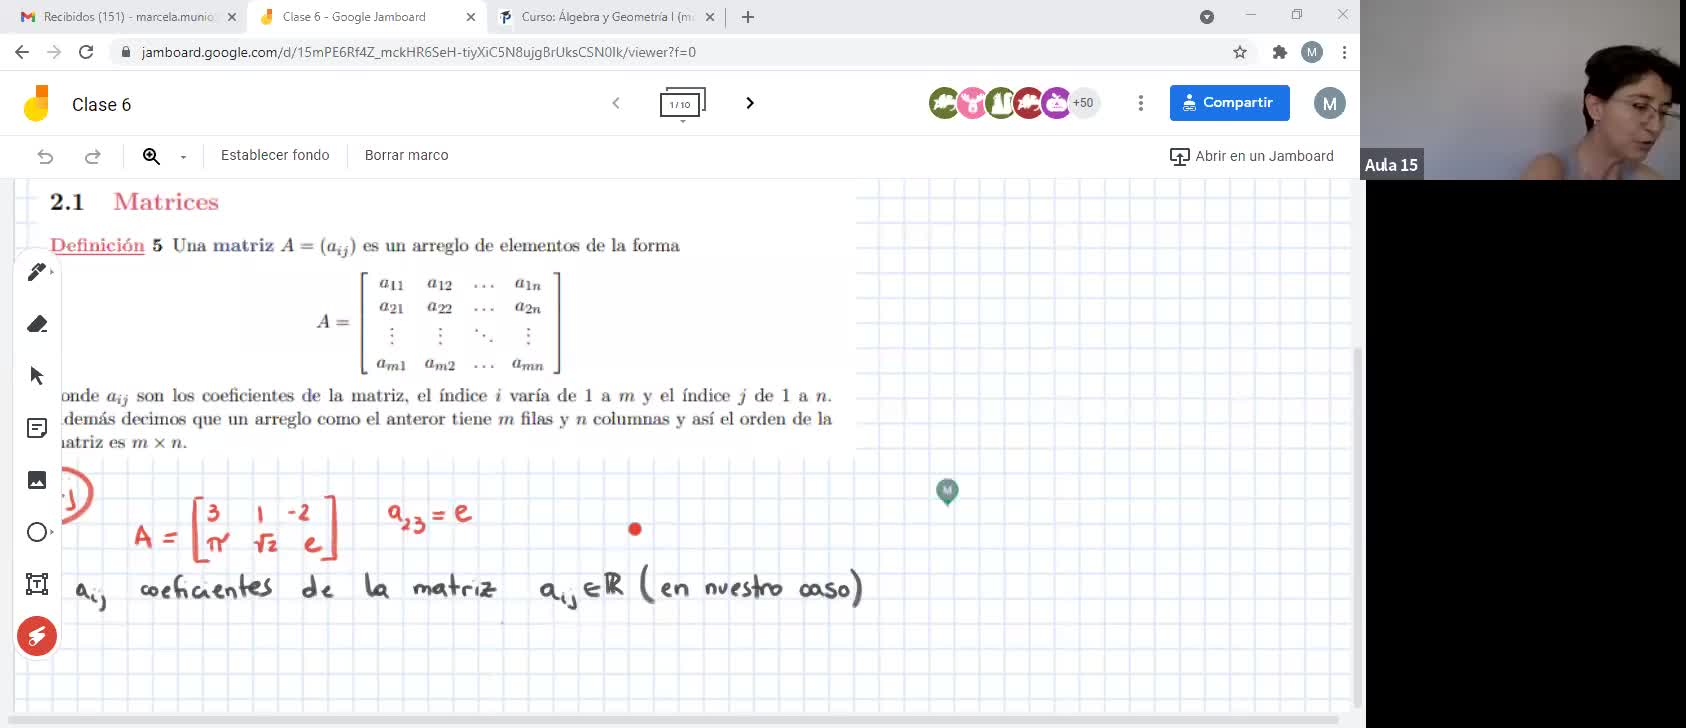 Ingeniería - AyGI(ModIIIyIV) - MuñozSantis - Matrices1